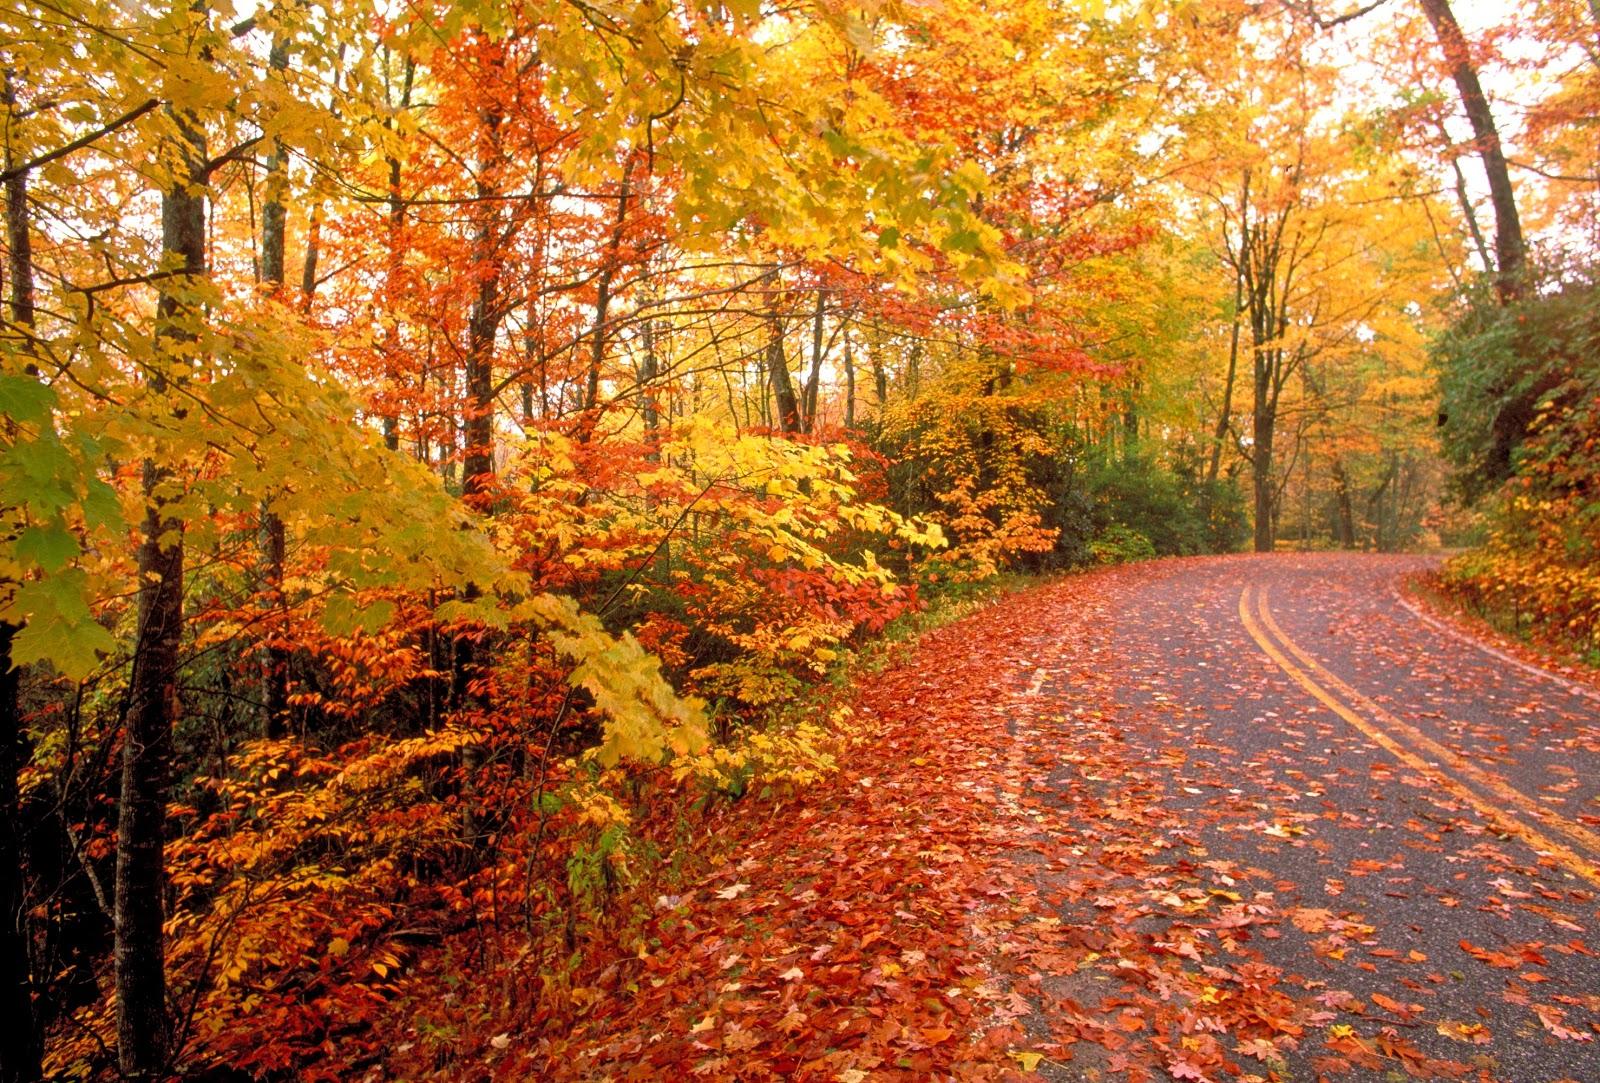 Simple Wallpapers Colors Fall Autumn Season Wallpapers Wallpapers Screensavers